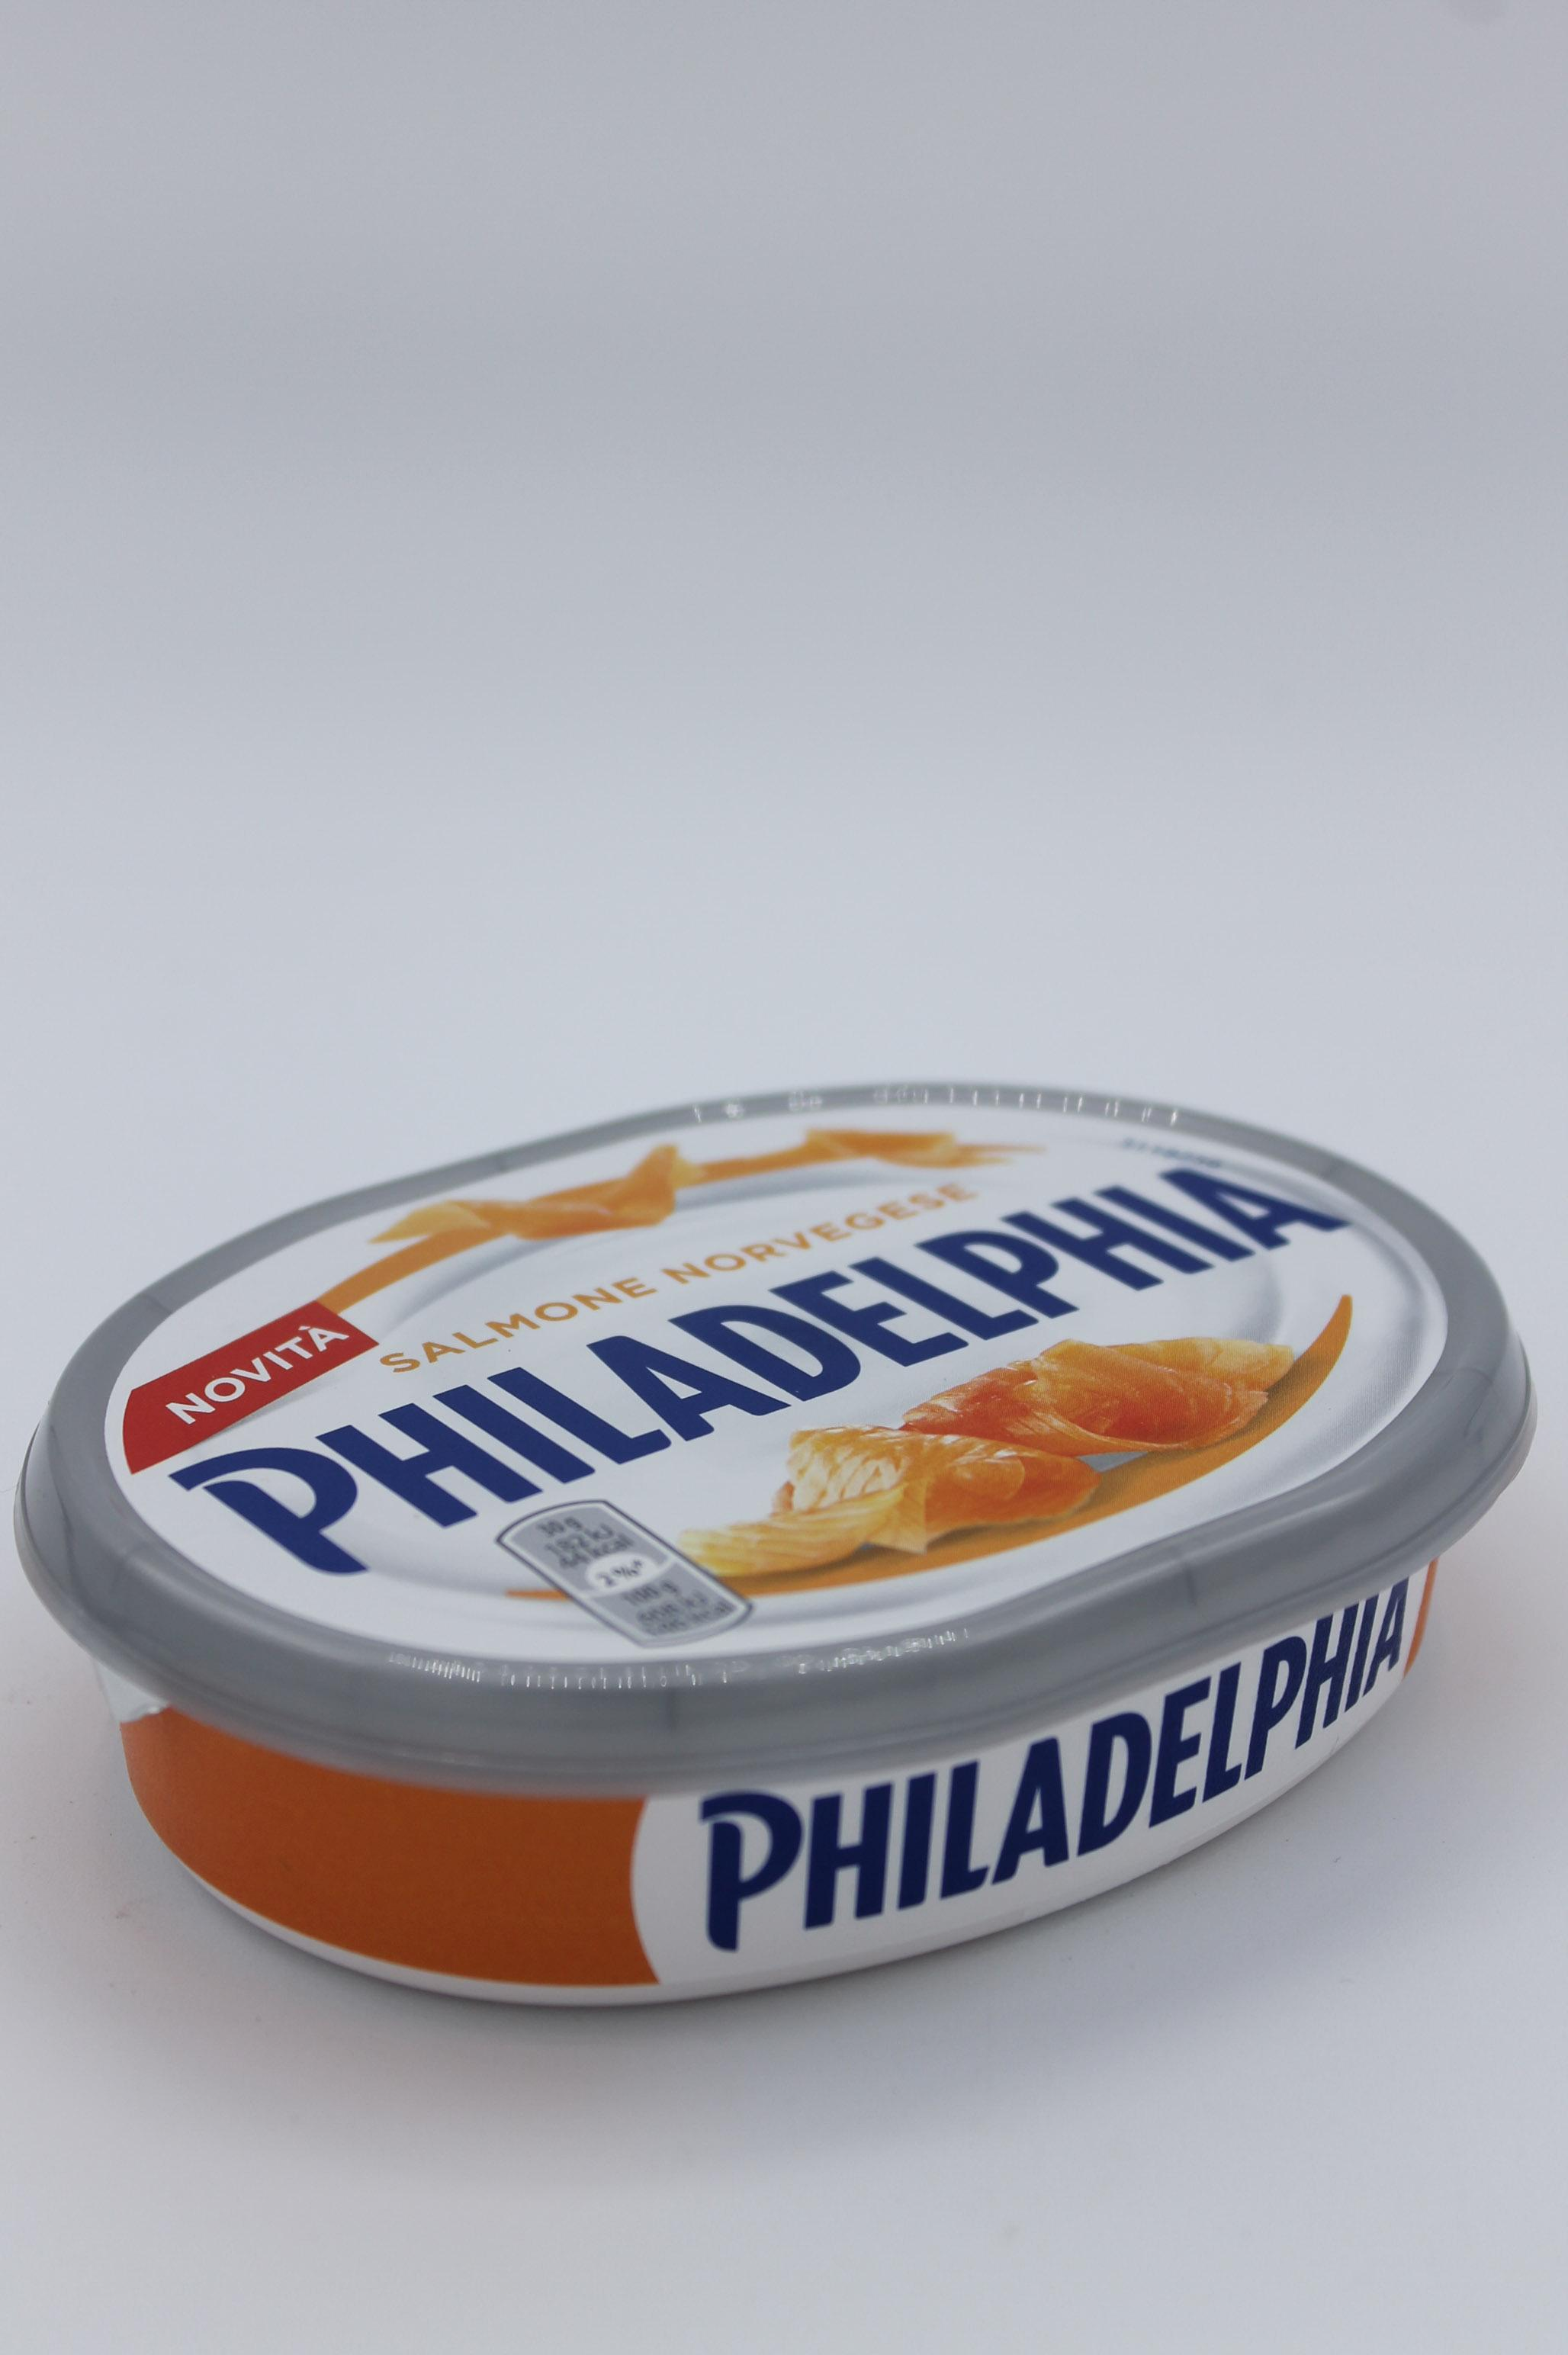 Philadelphia salmone 150gr.